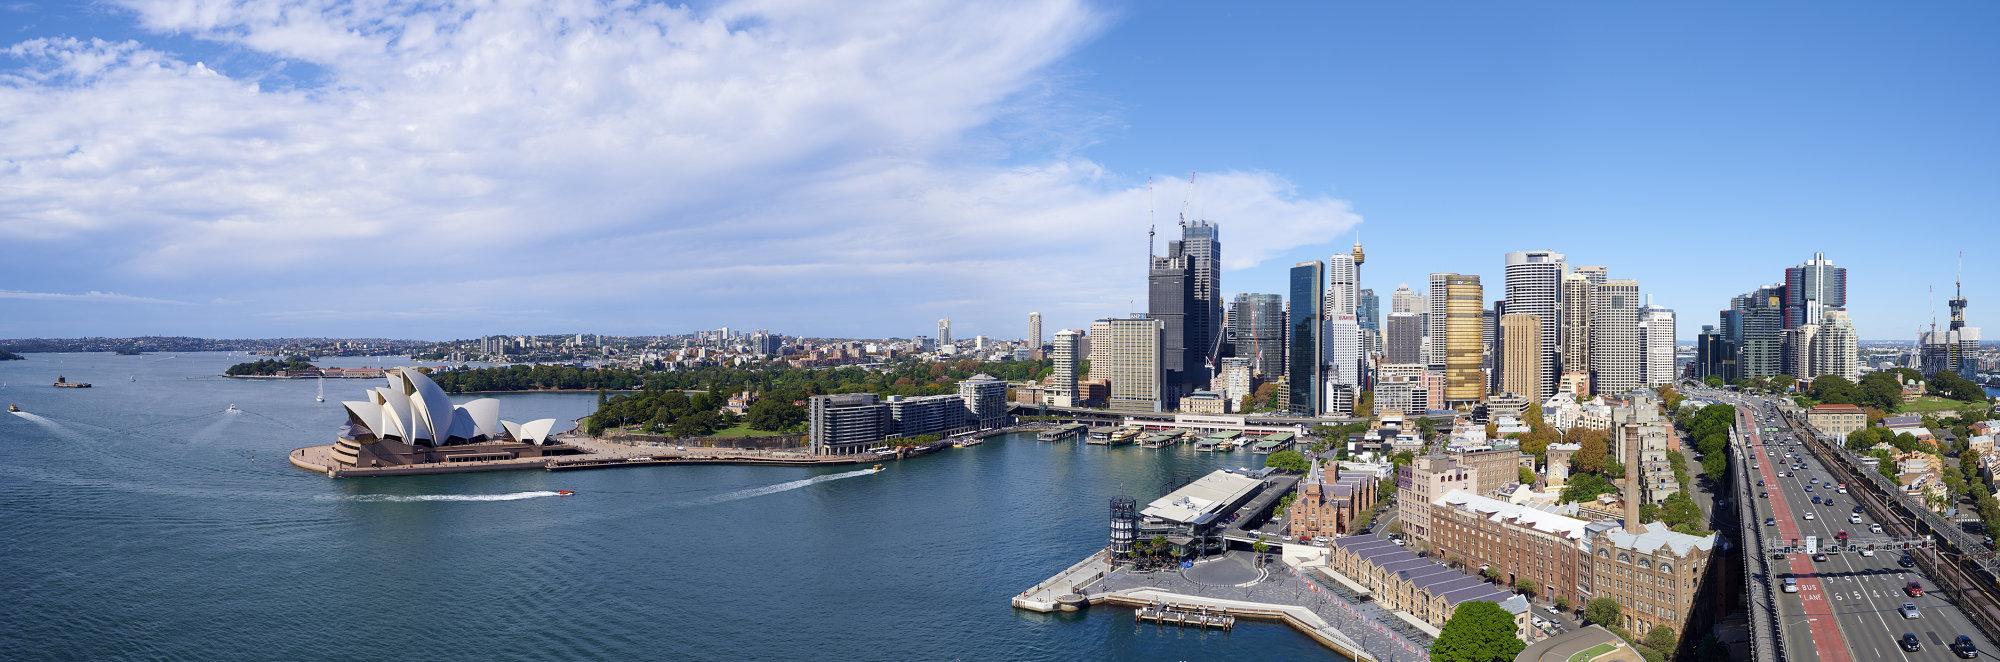 Sydney City Panorama